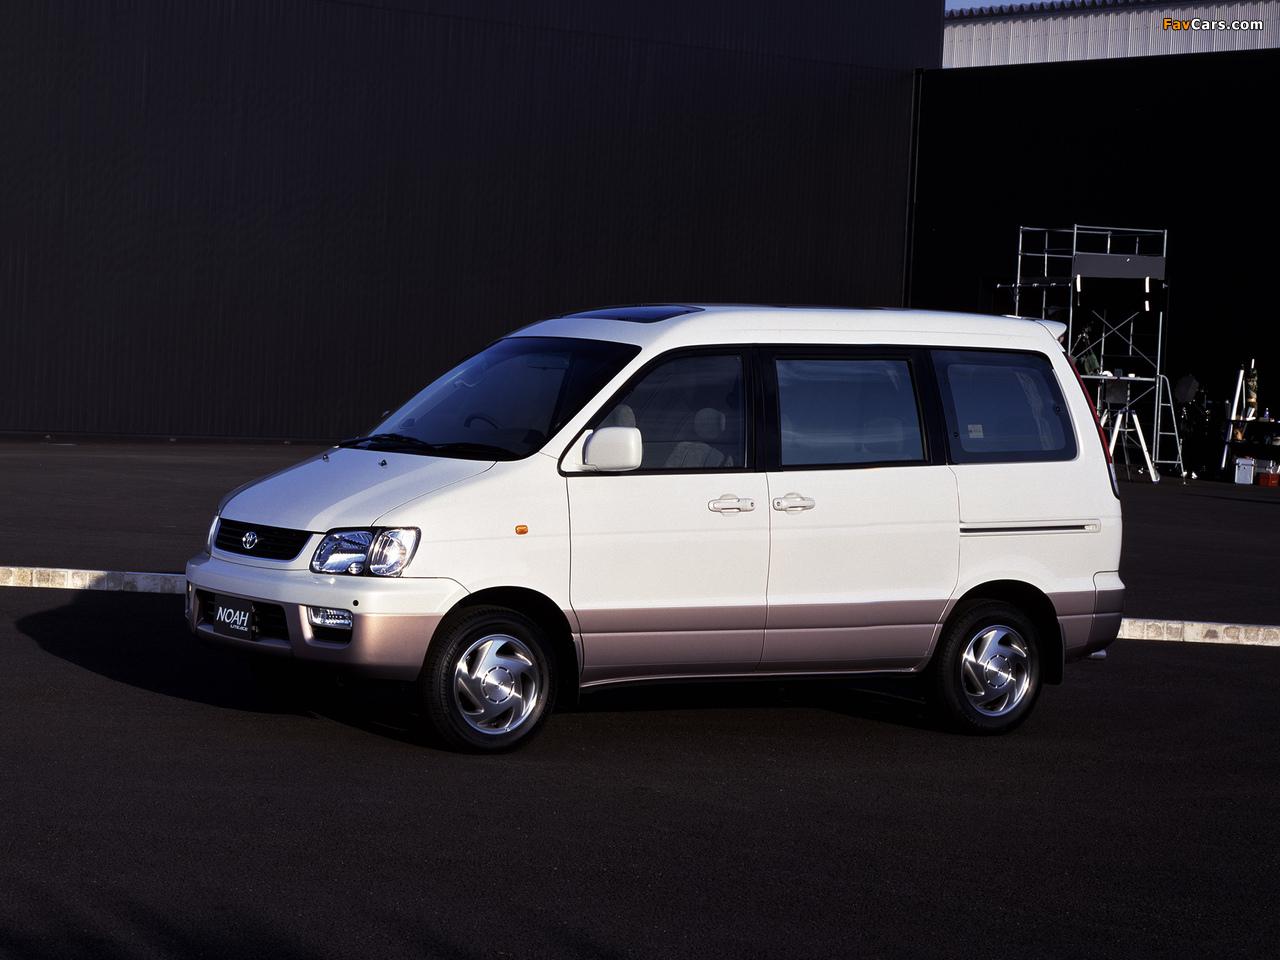 Toyota LiteAce Noah 2WD (R40G) 1996 photos (1280 x 960)